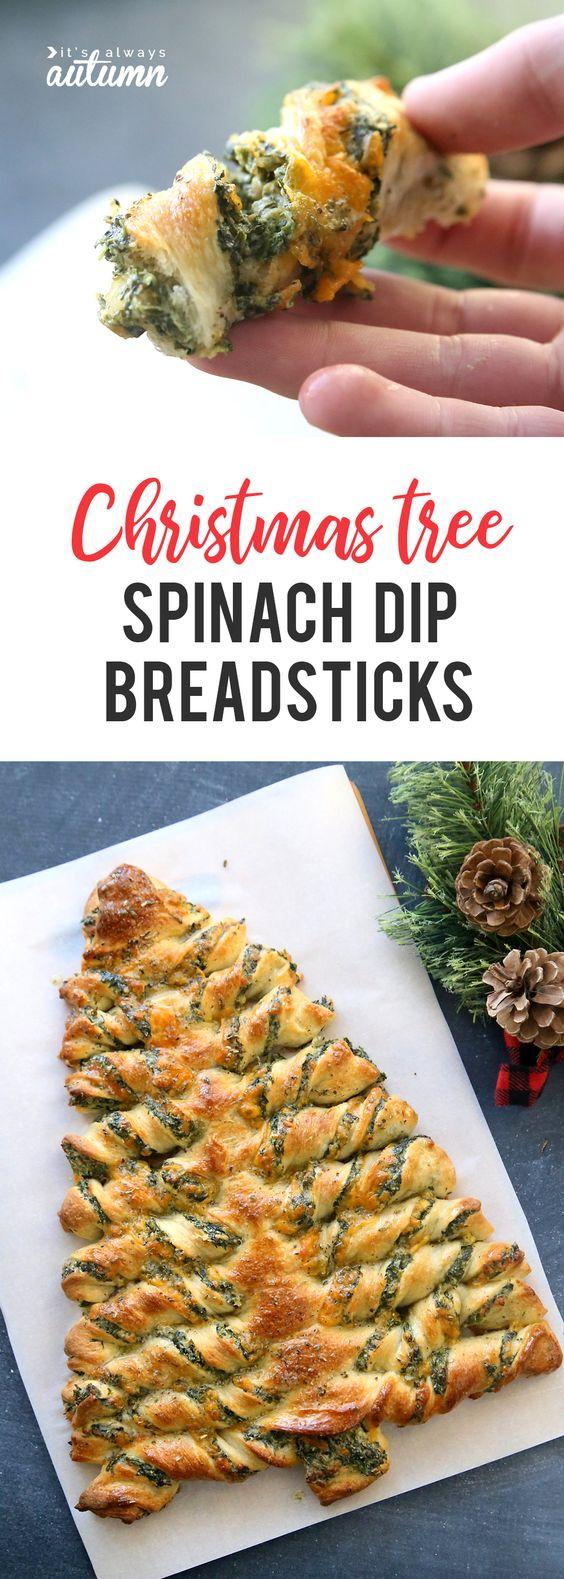 CHRISTMAS TREE SPINACH DIP BREADSTICKS